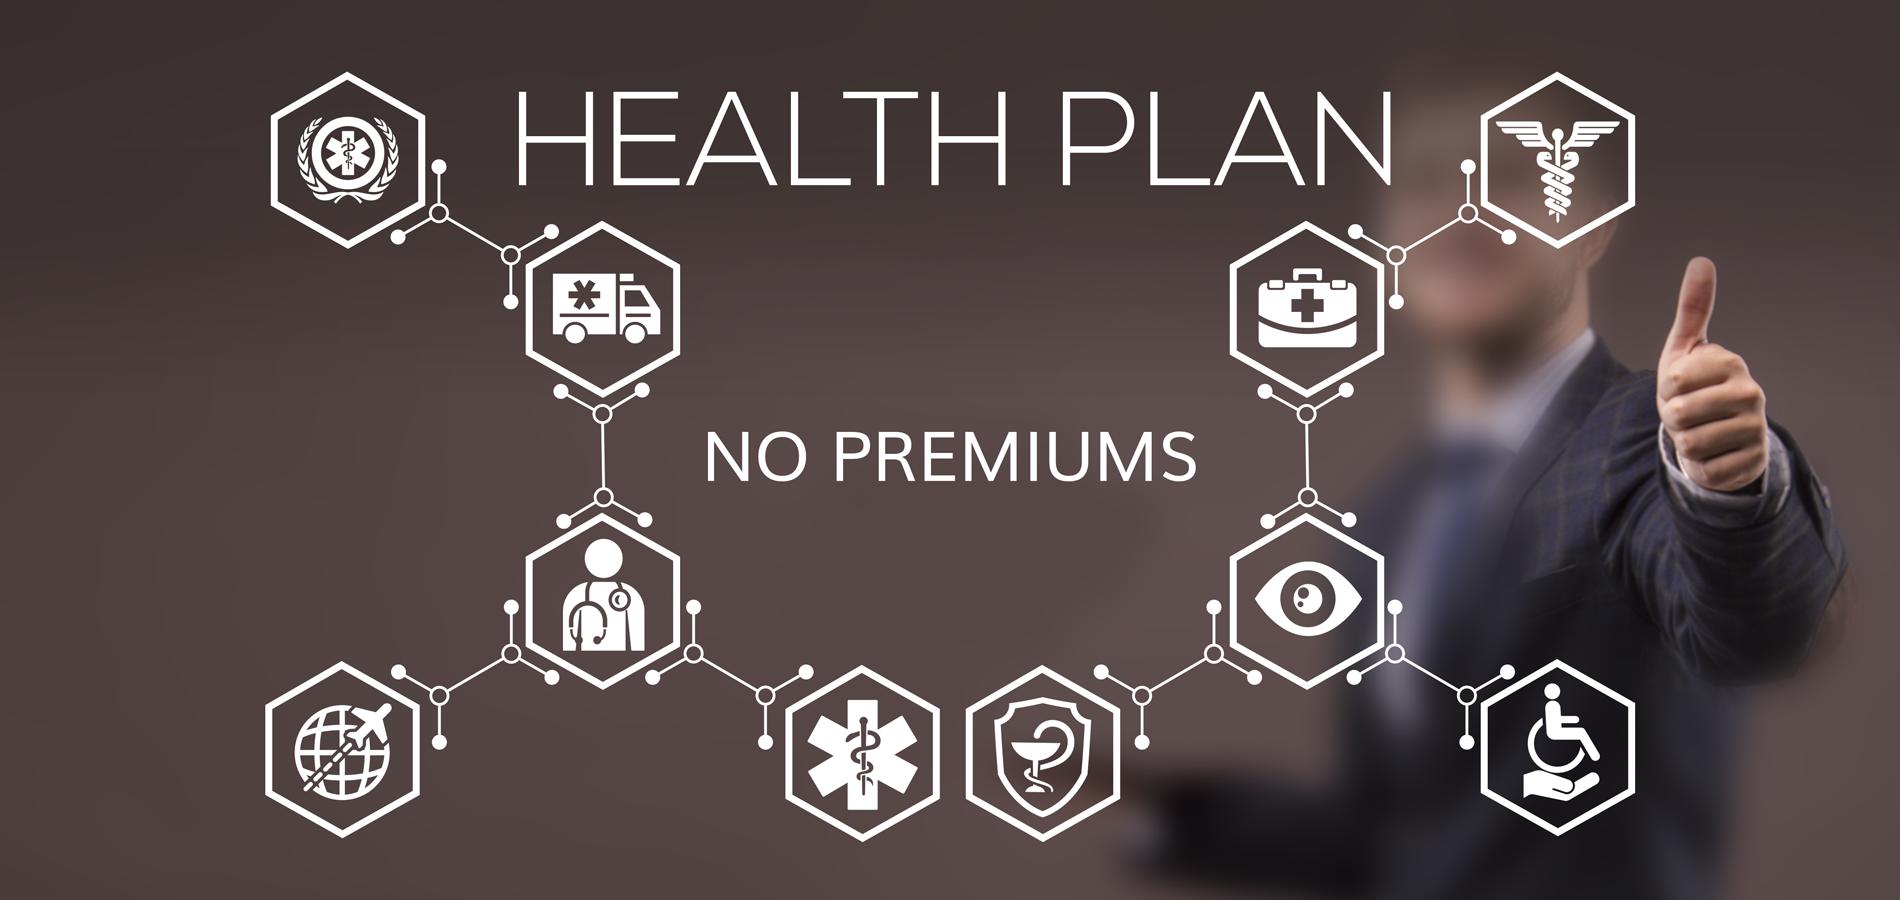 health-plan-no-premiums.png